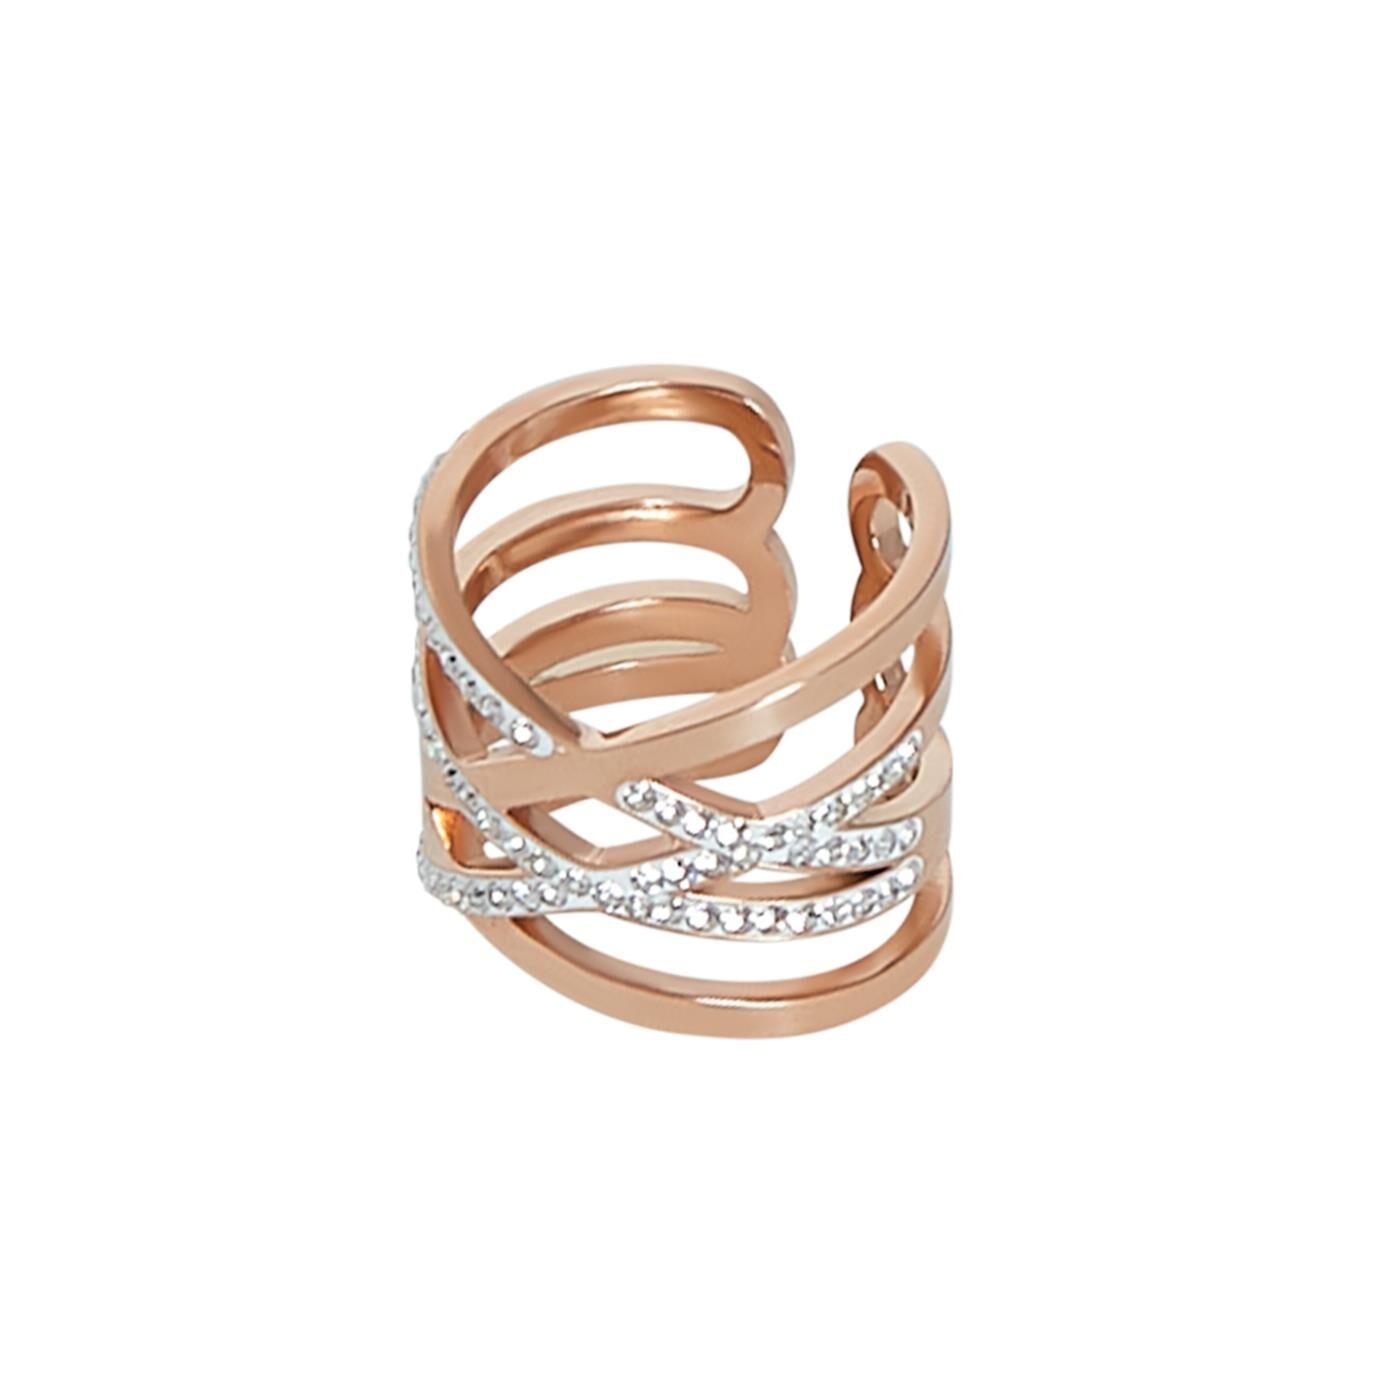 Celestino Πολύσειρο δαχτυλίδι με strass  - Ροζ - Grootte: 17;19